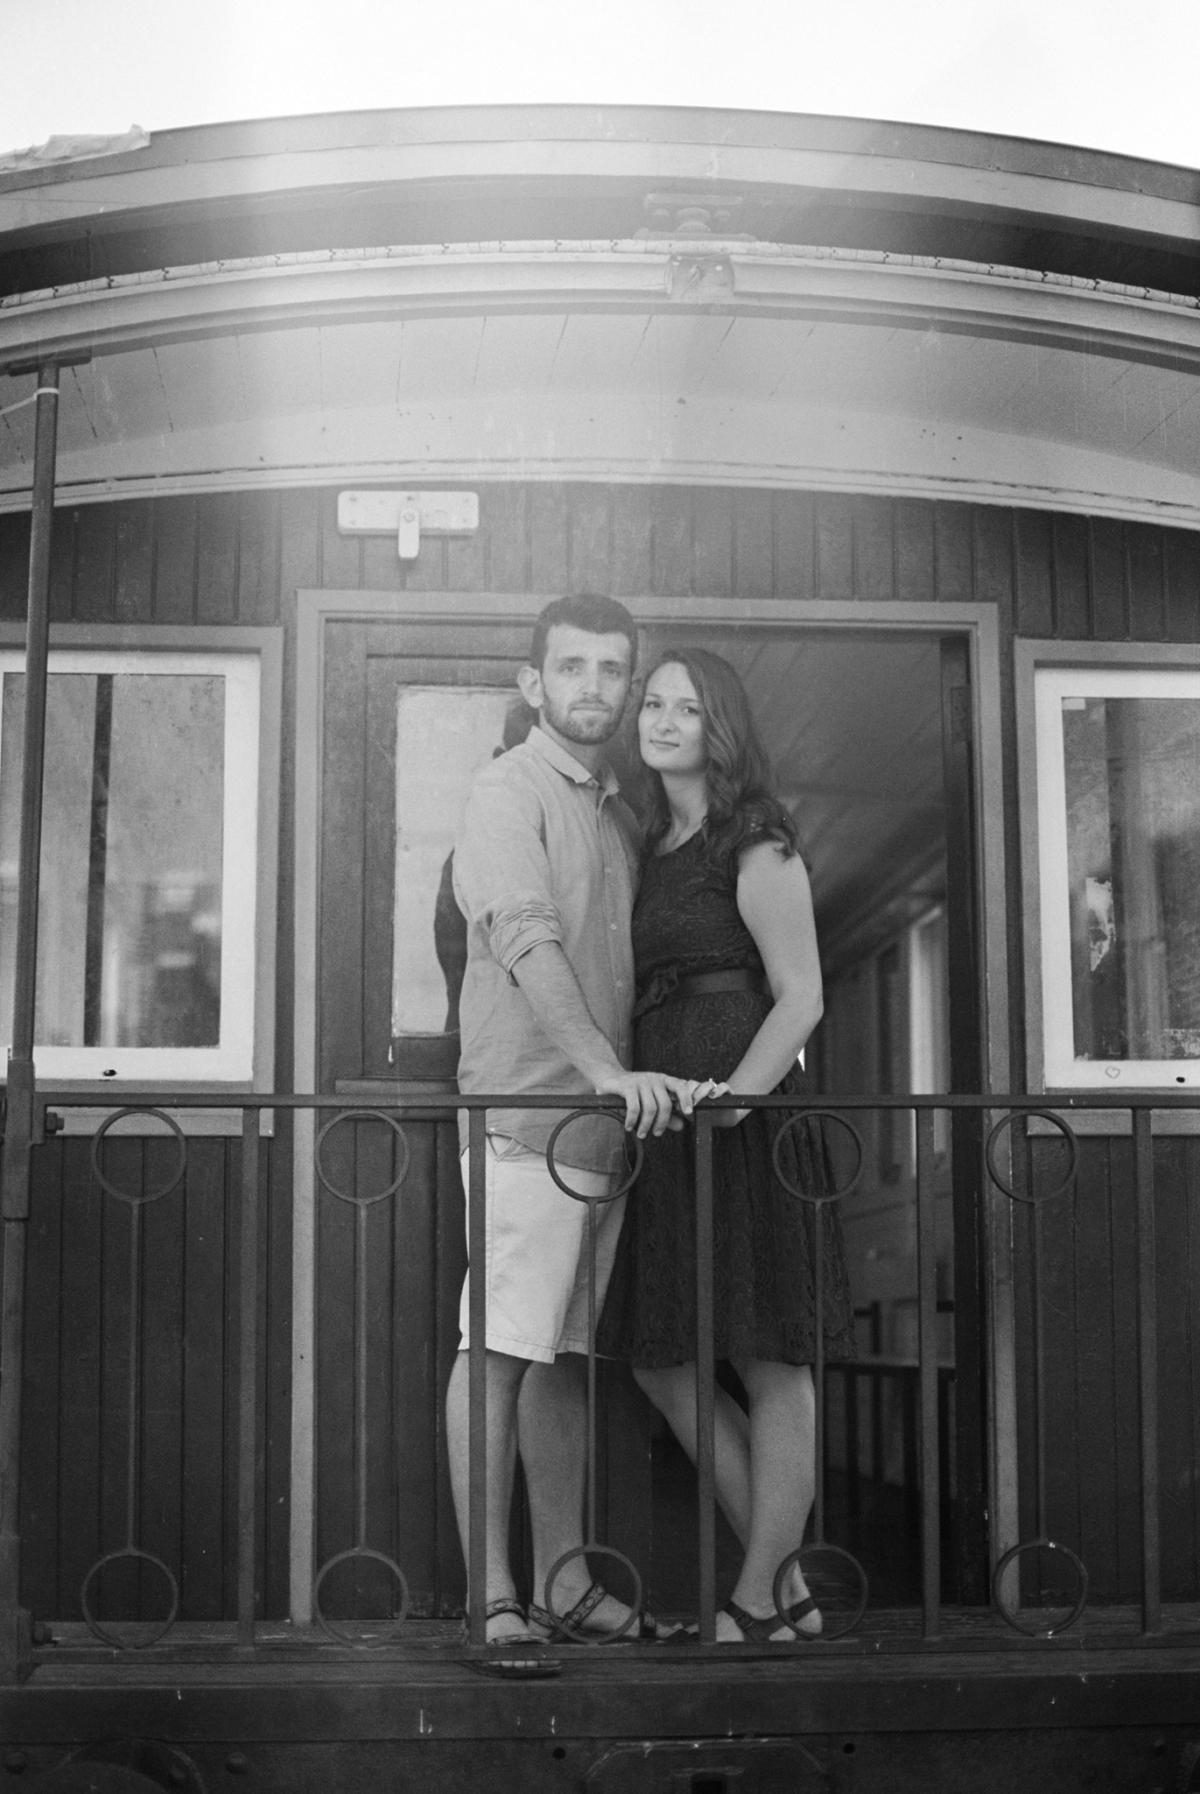 Hatachana Tel Aviv Engagement - Galia and Michael - Sigala Photography_0008